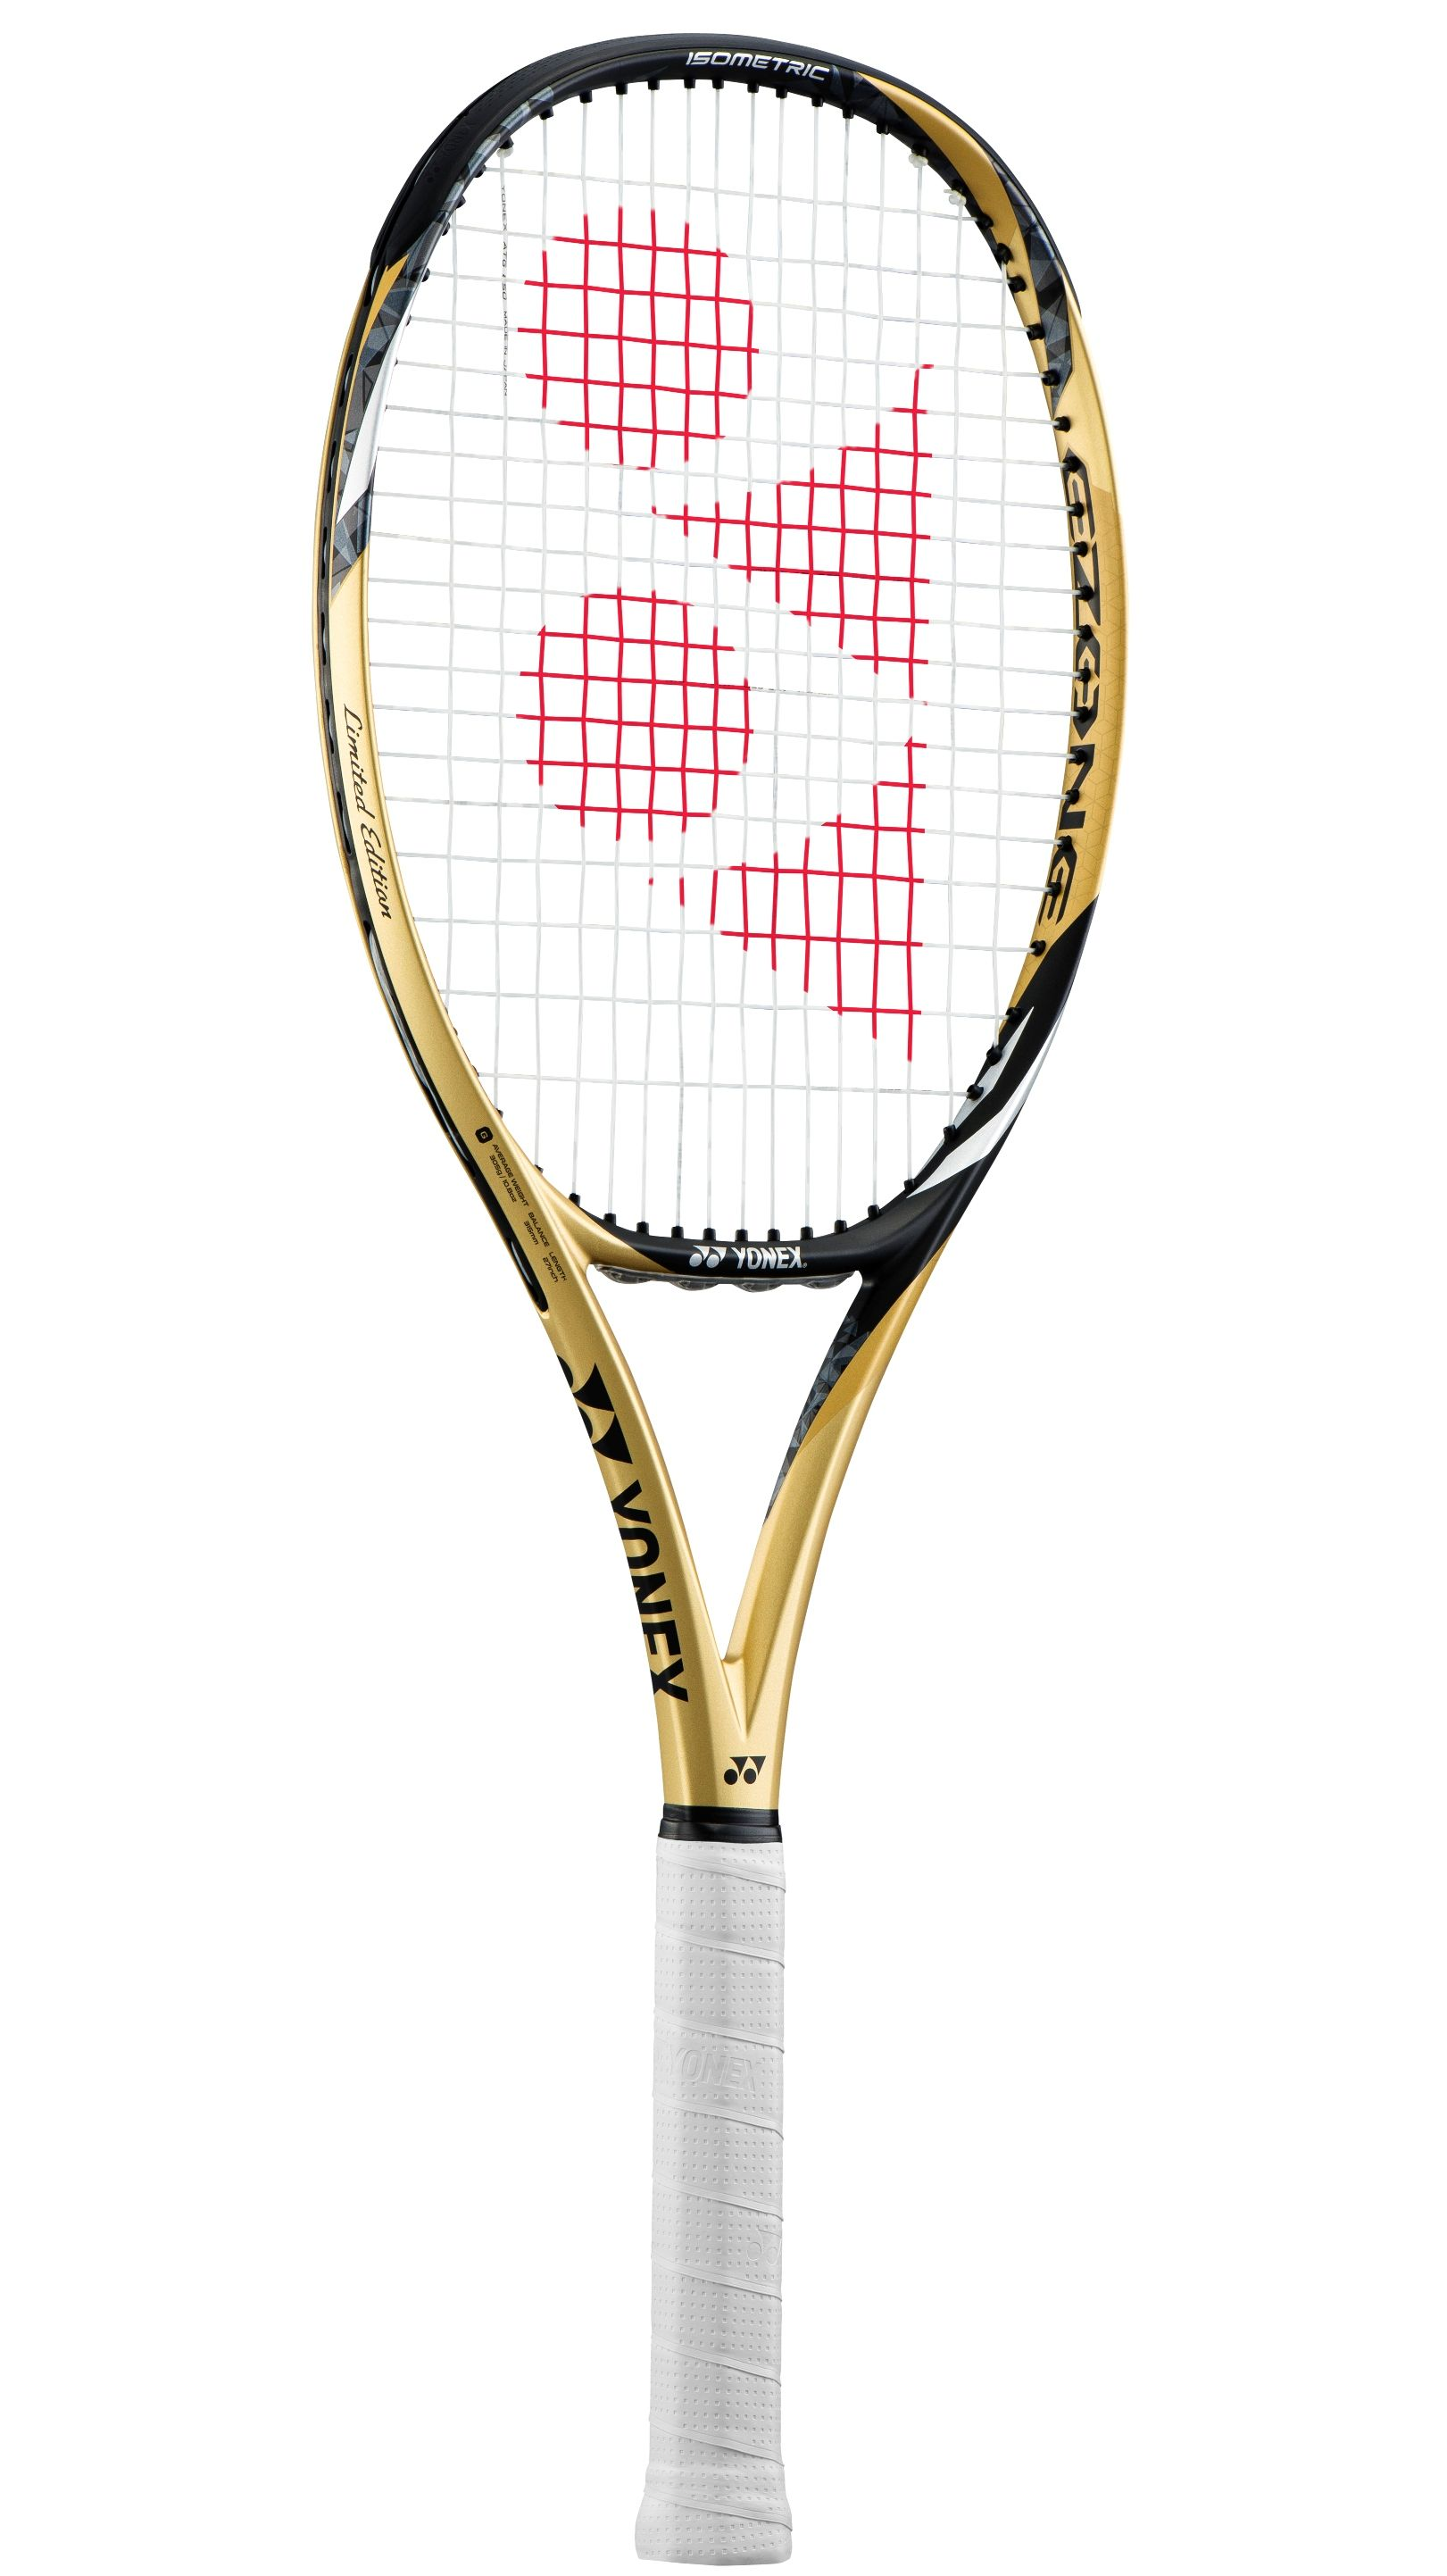 Yonex Ezone 98 Limited Edition Gold Tennis Racquet 305g 130 00 Yonex Tennis Racquet Racquets